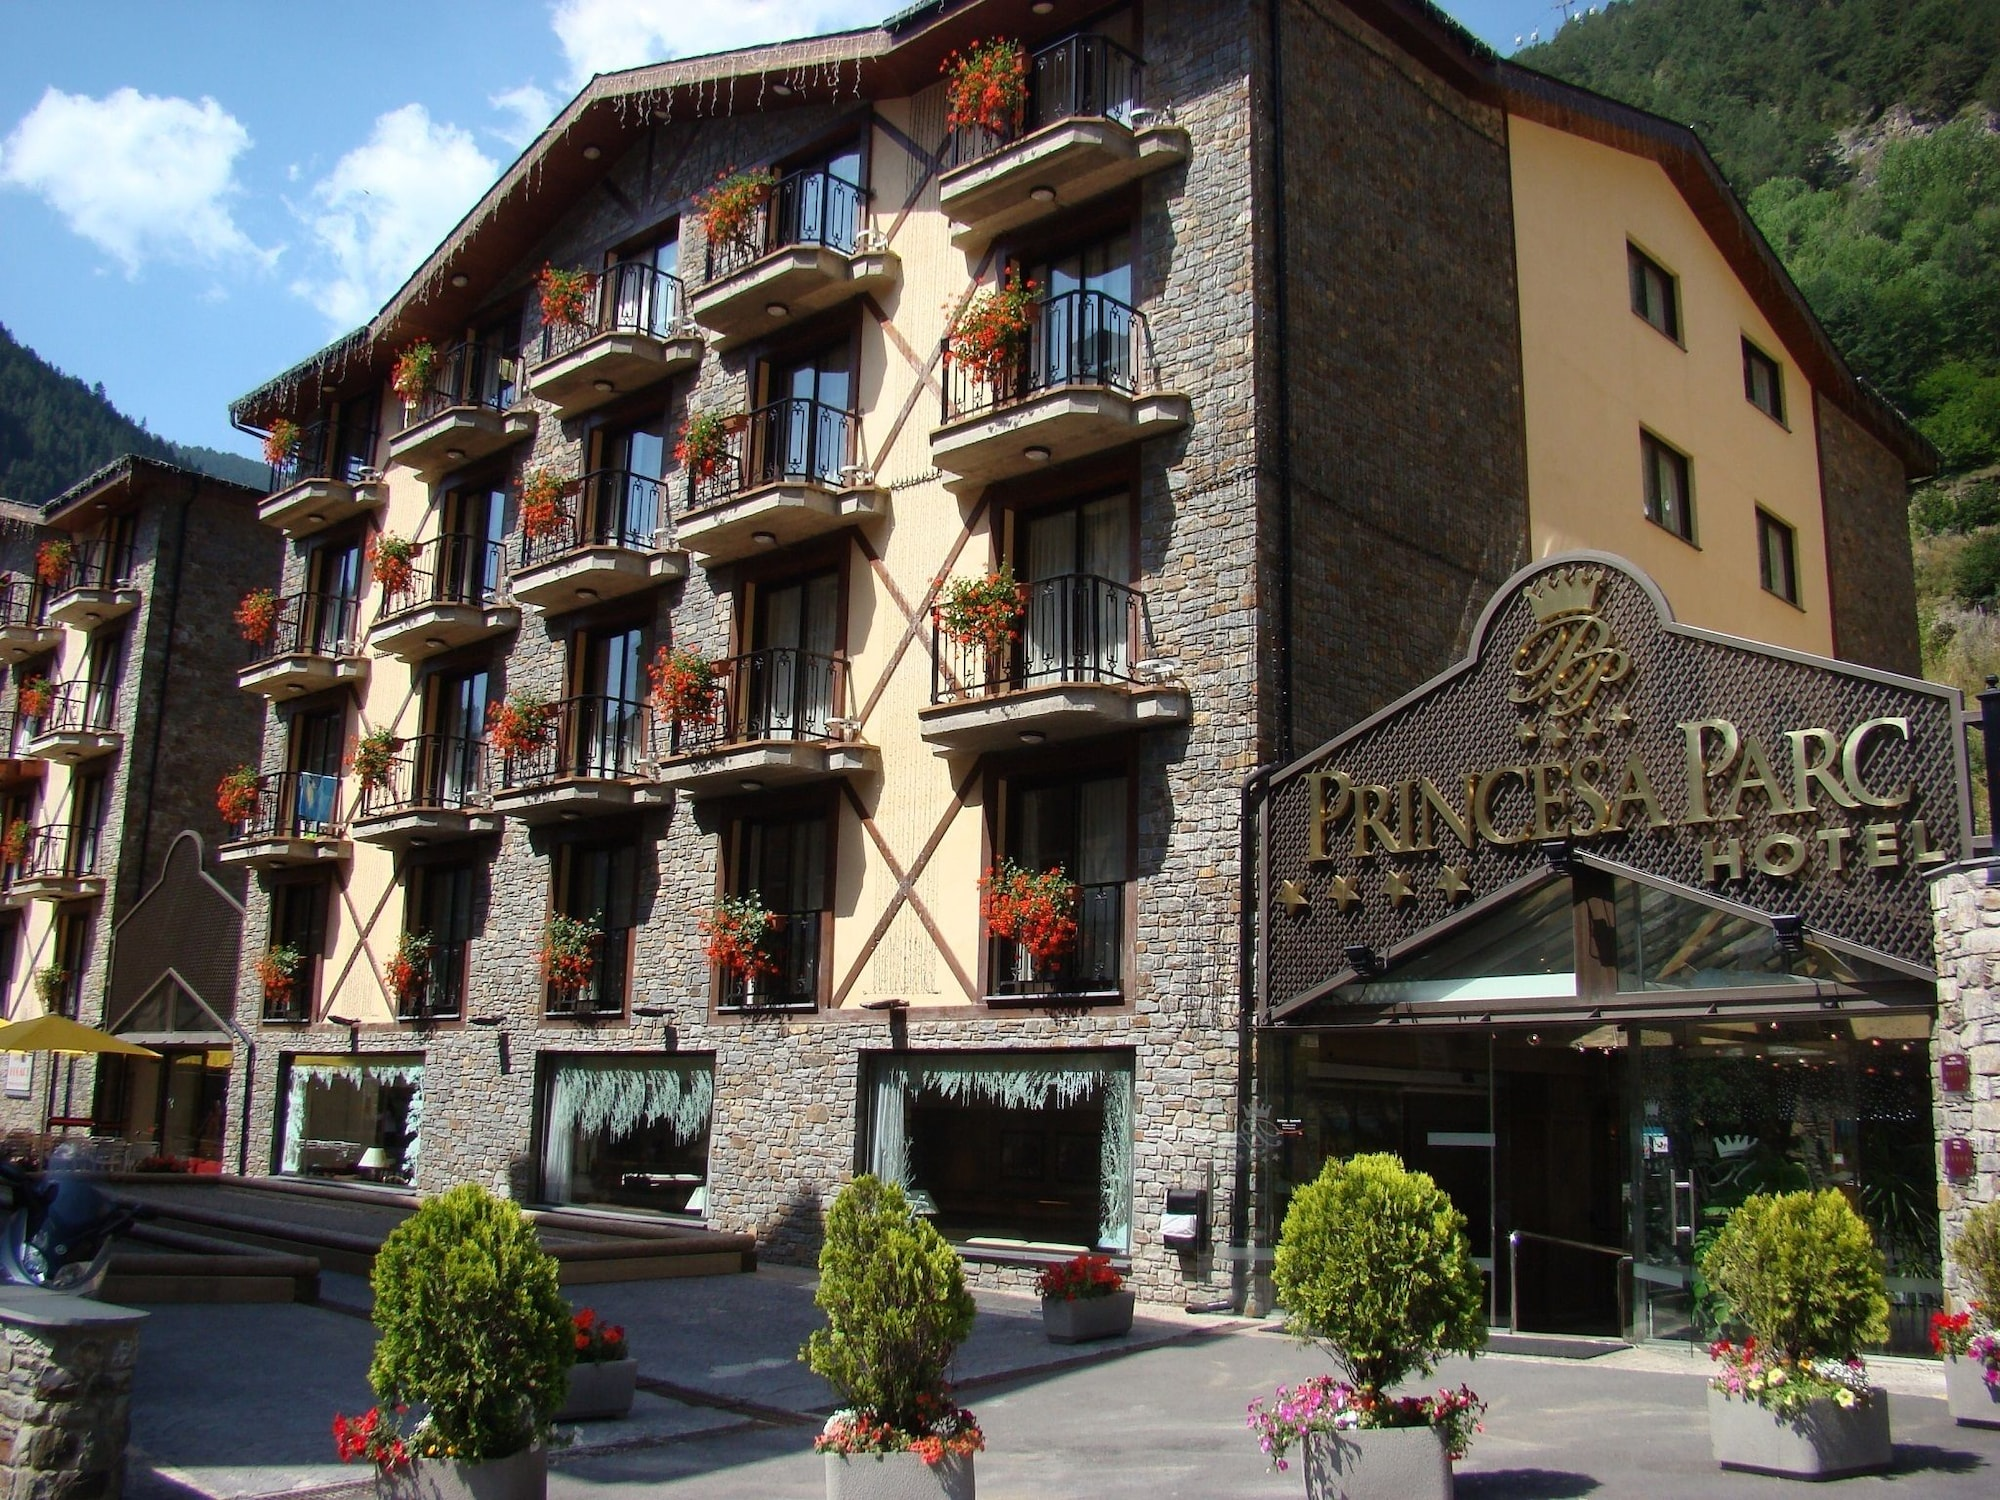 Hotel Diana Parc,